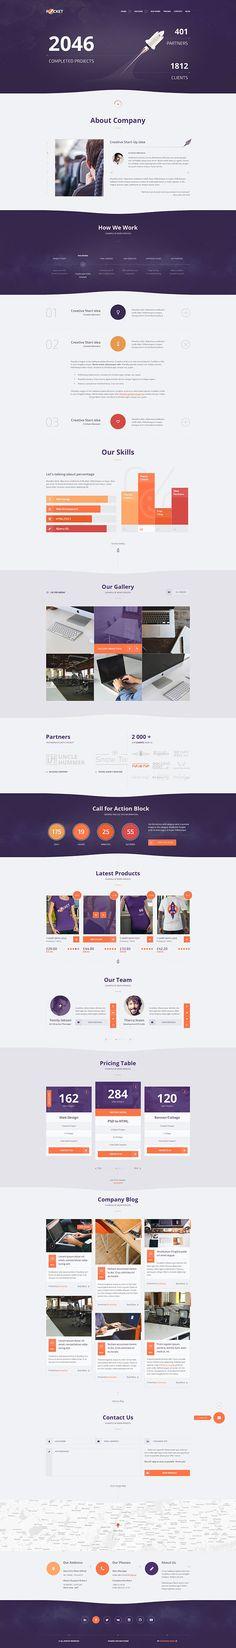 10-templates-PSD-gratuits_7